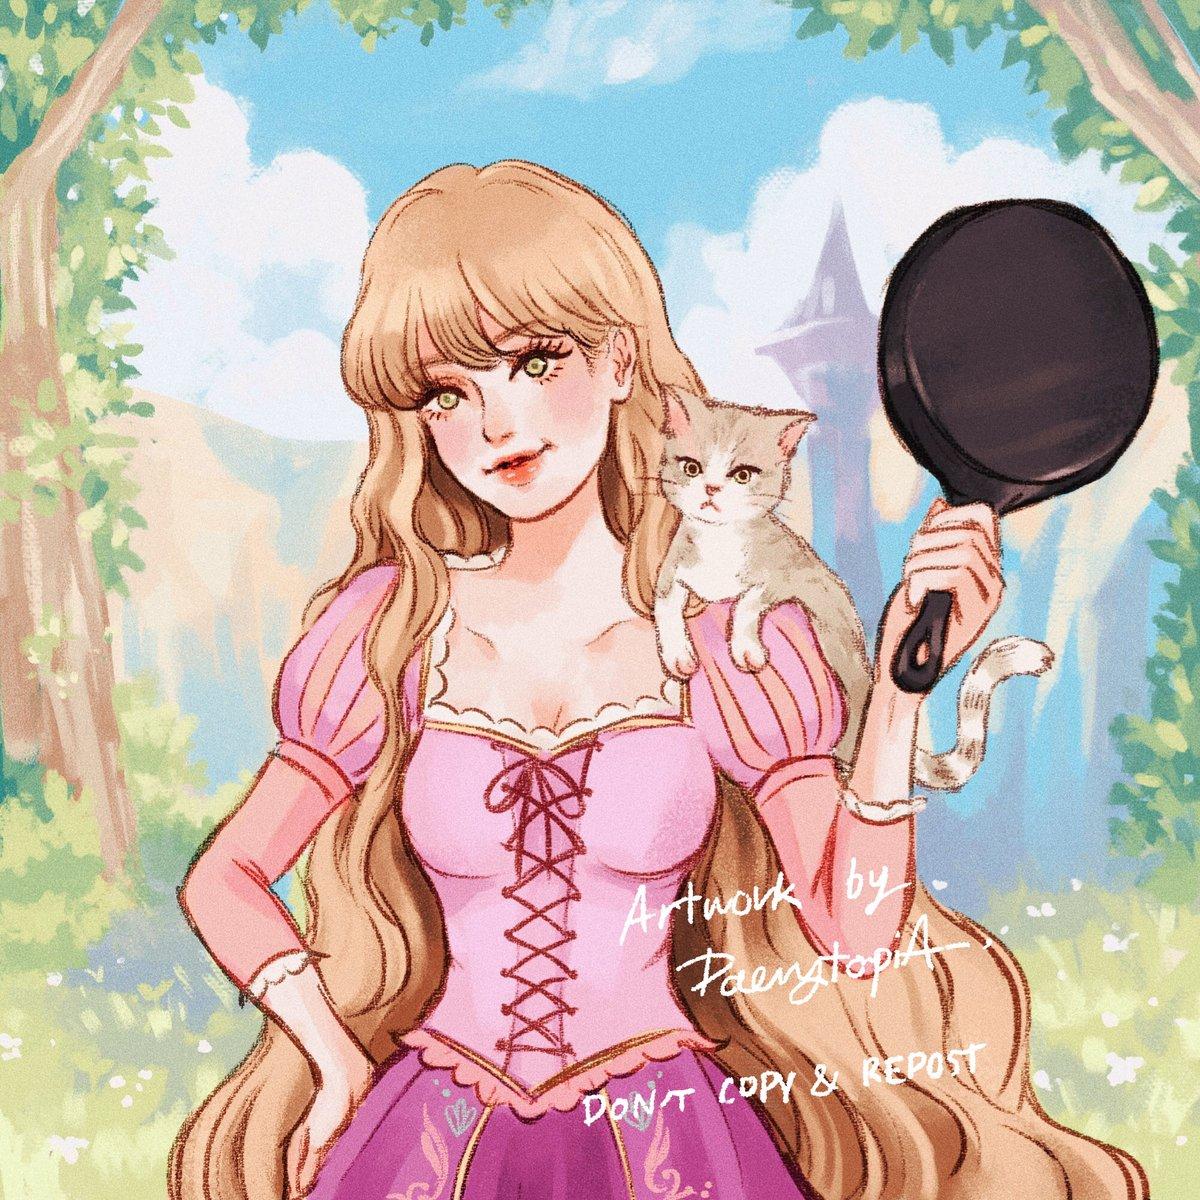 BLACKPINK x Princess Project 👸  รับสาวๆไปซักองค์มั้ยคะเจ้าชายย 💖 เป็นโปรเจคที่วาดสนุกมากเพราะเราติ่งทั้ง Disney และ Blackpink เลยเอามาผสมกันซะเลย ☺  My work 👉 #paerytopia  ❌don't repost my work❌  #lisa #rose #jennie #jisoo #blackpink #blackpinkfanart #blink #disney